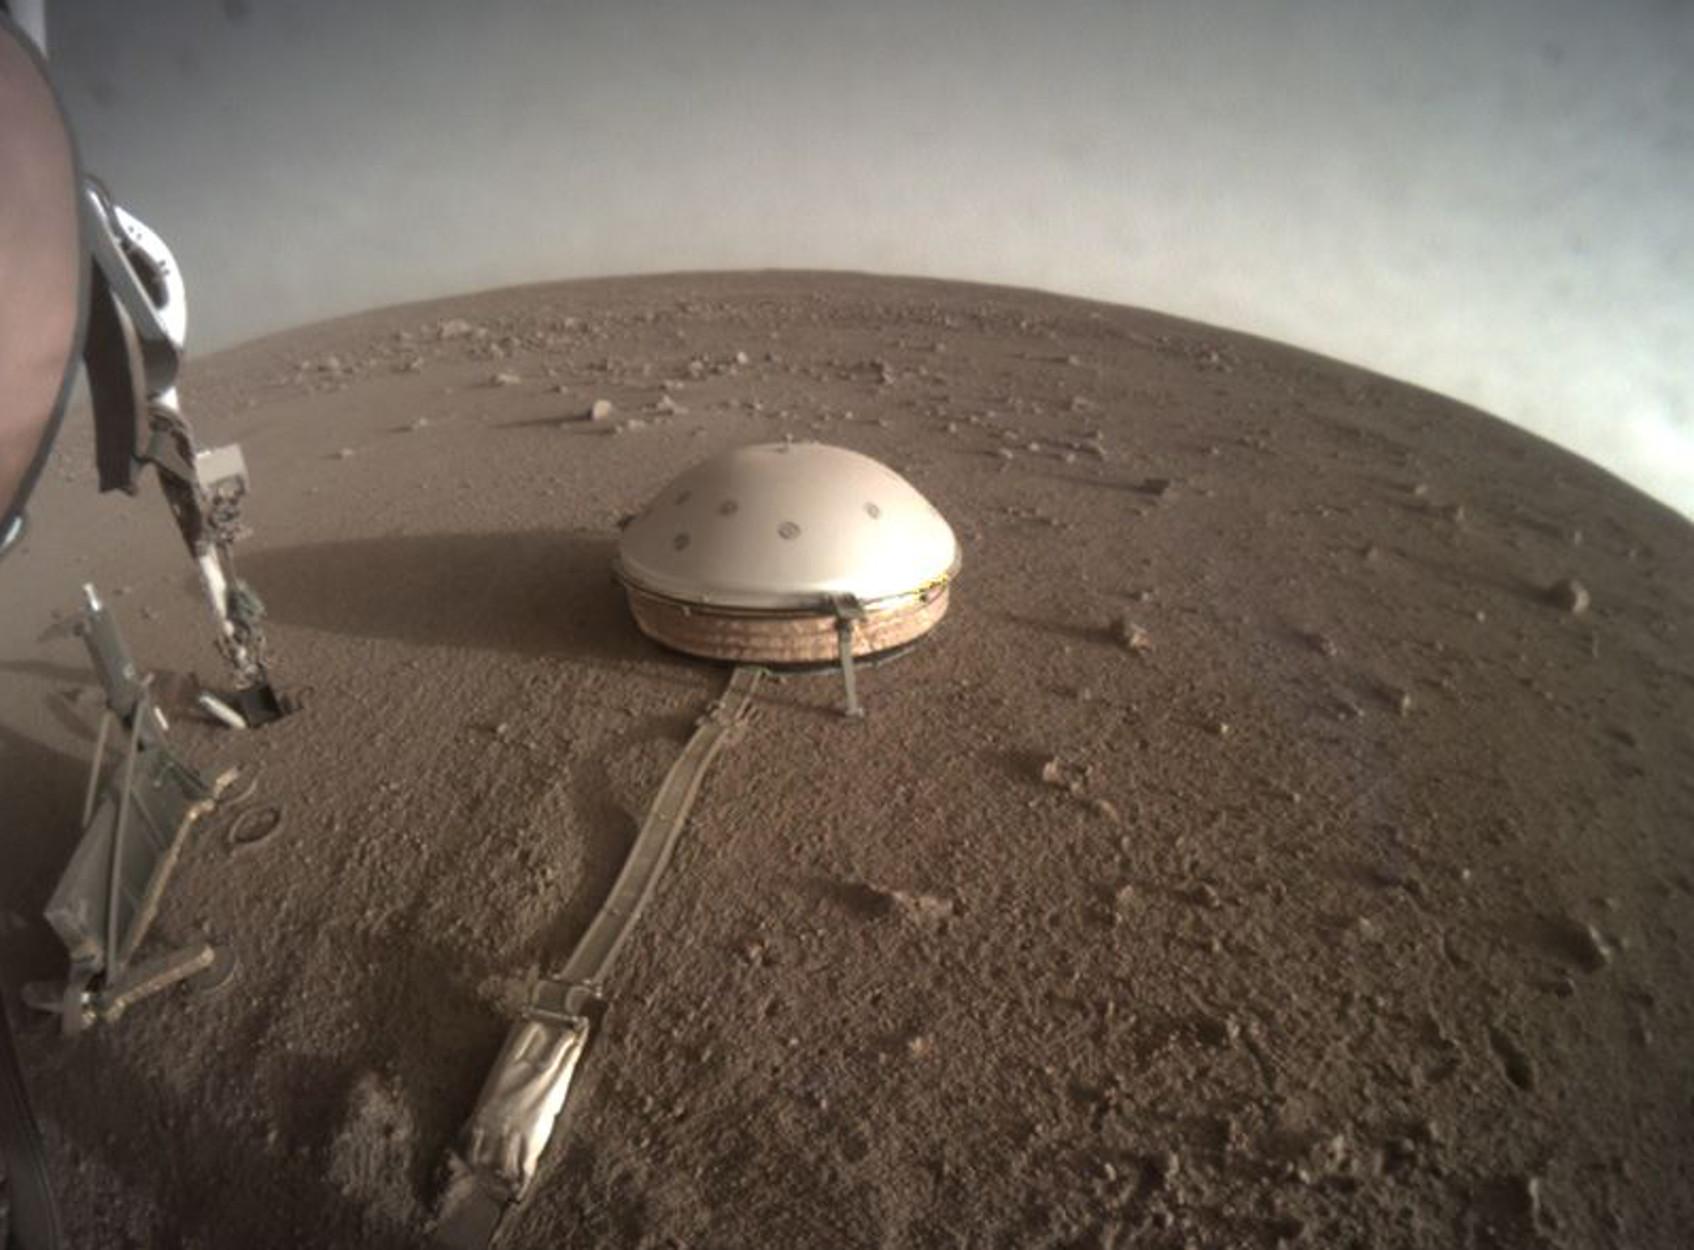 NASA: Σείεται από σεισμούς ο Άρης! 322 έχει καταγράψει το InSight